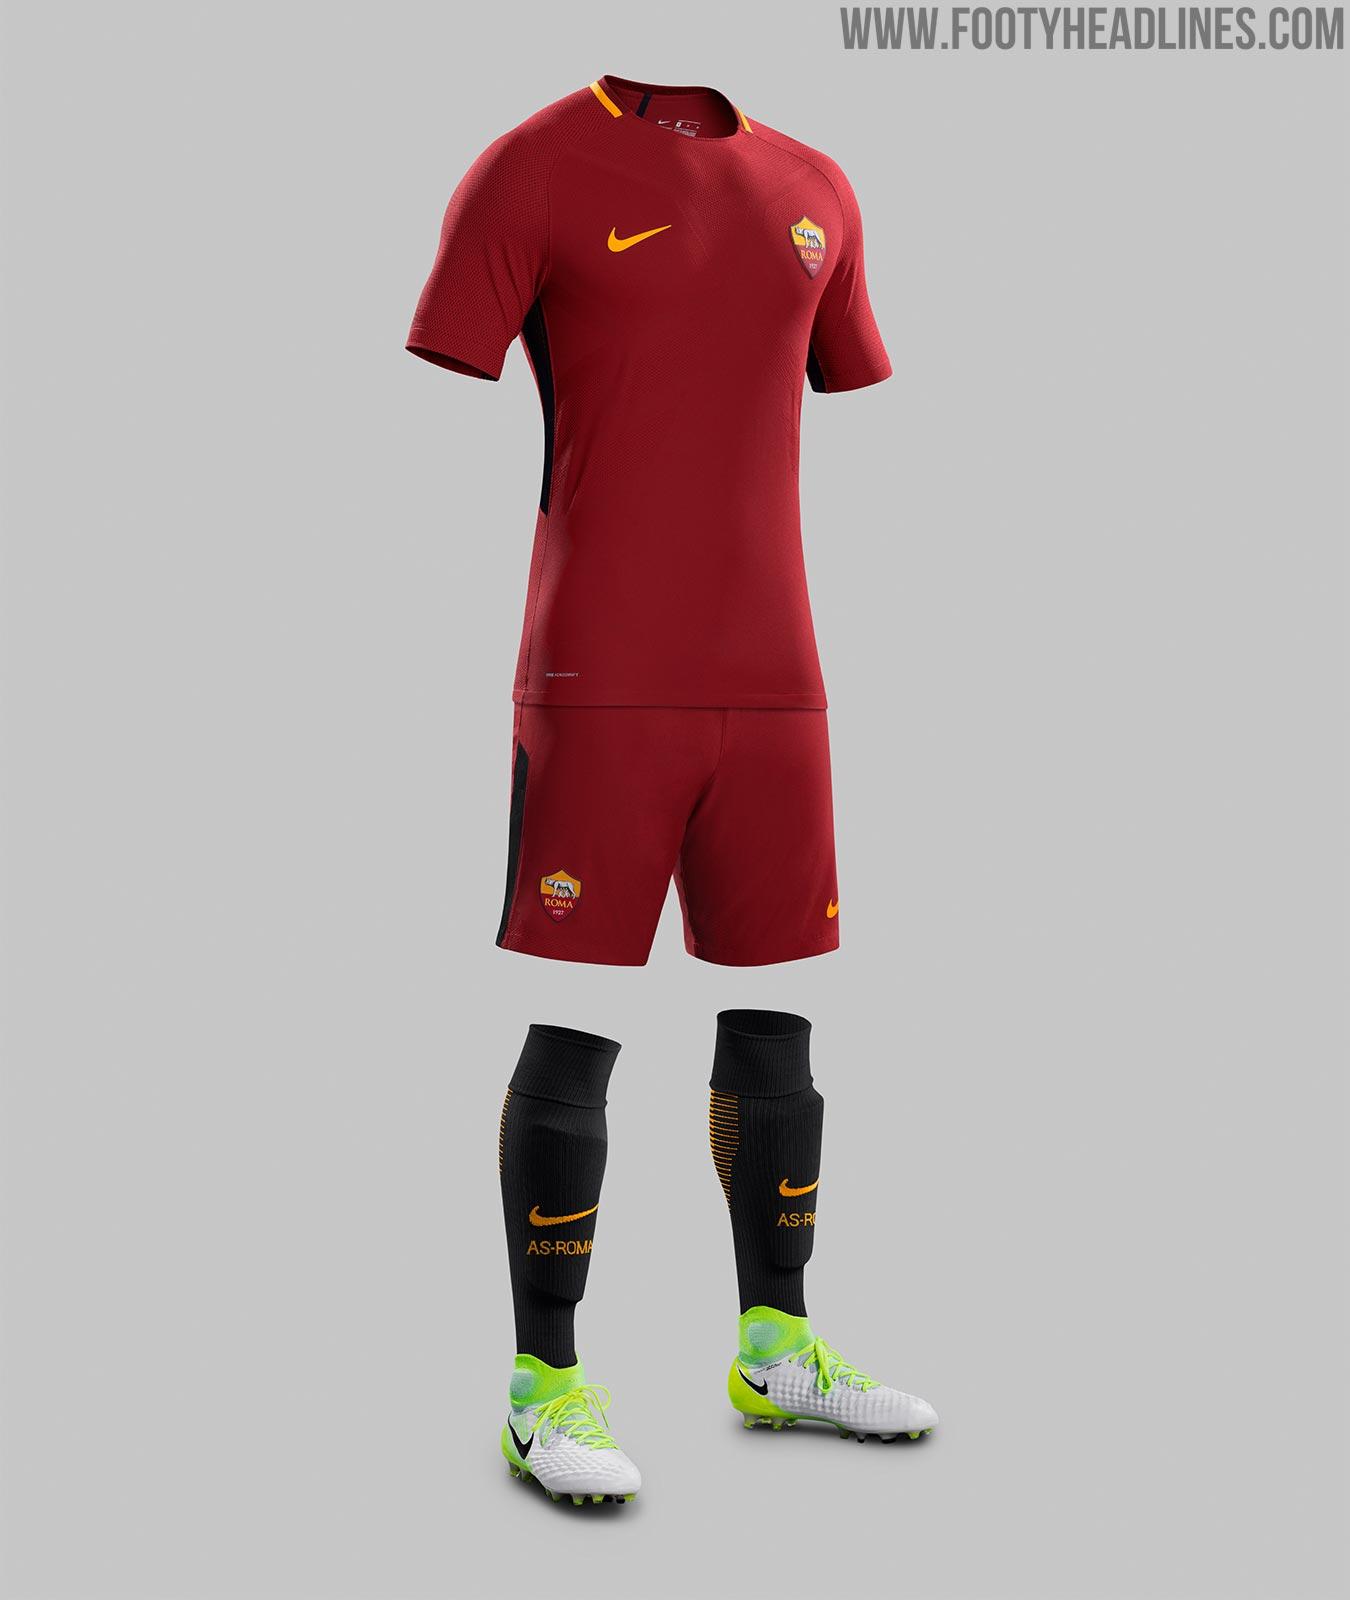 AS Roma 17 18 Home Kit Revealed Footy Headlines